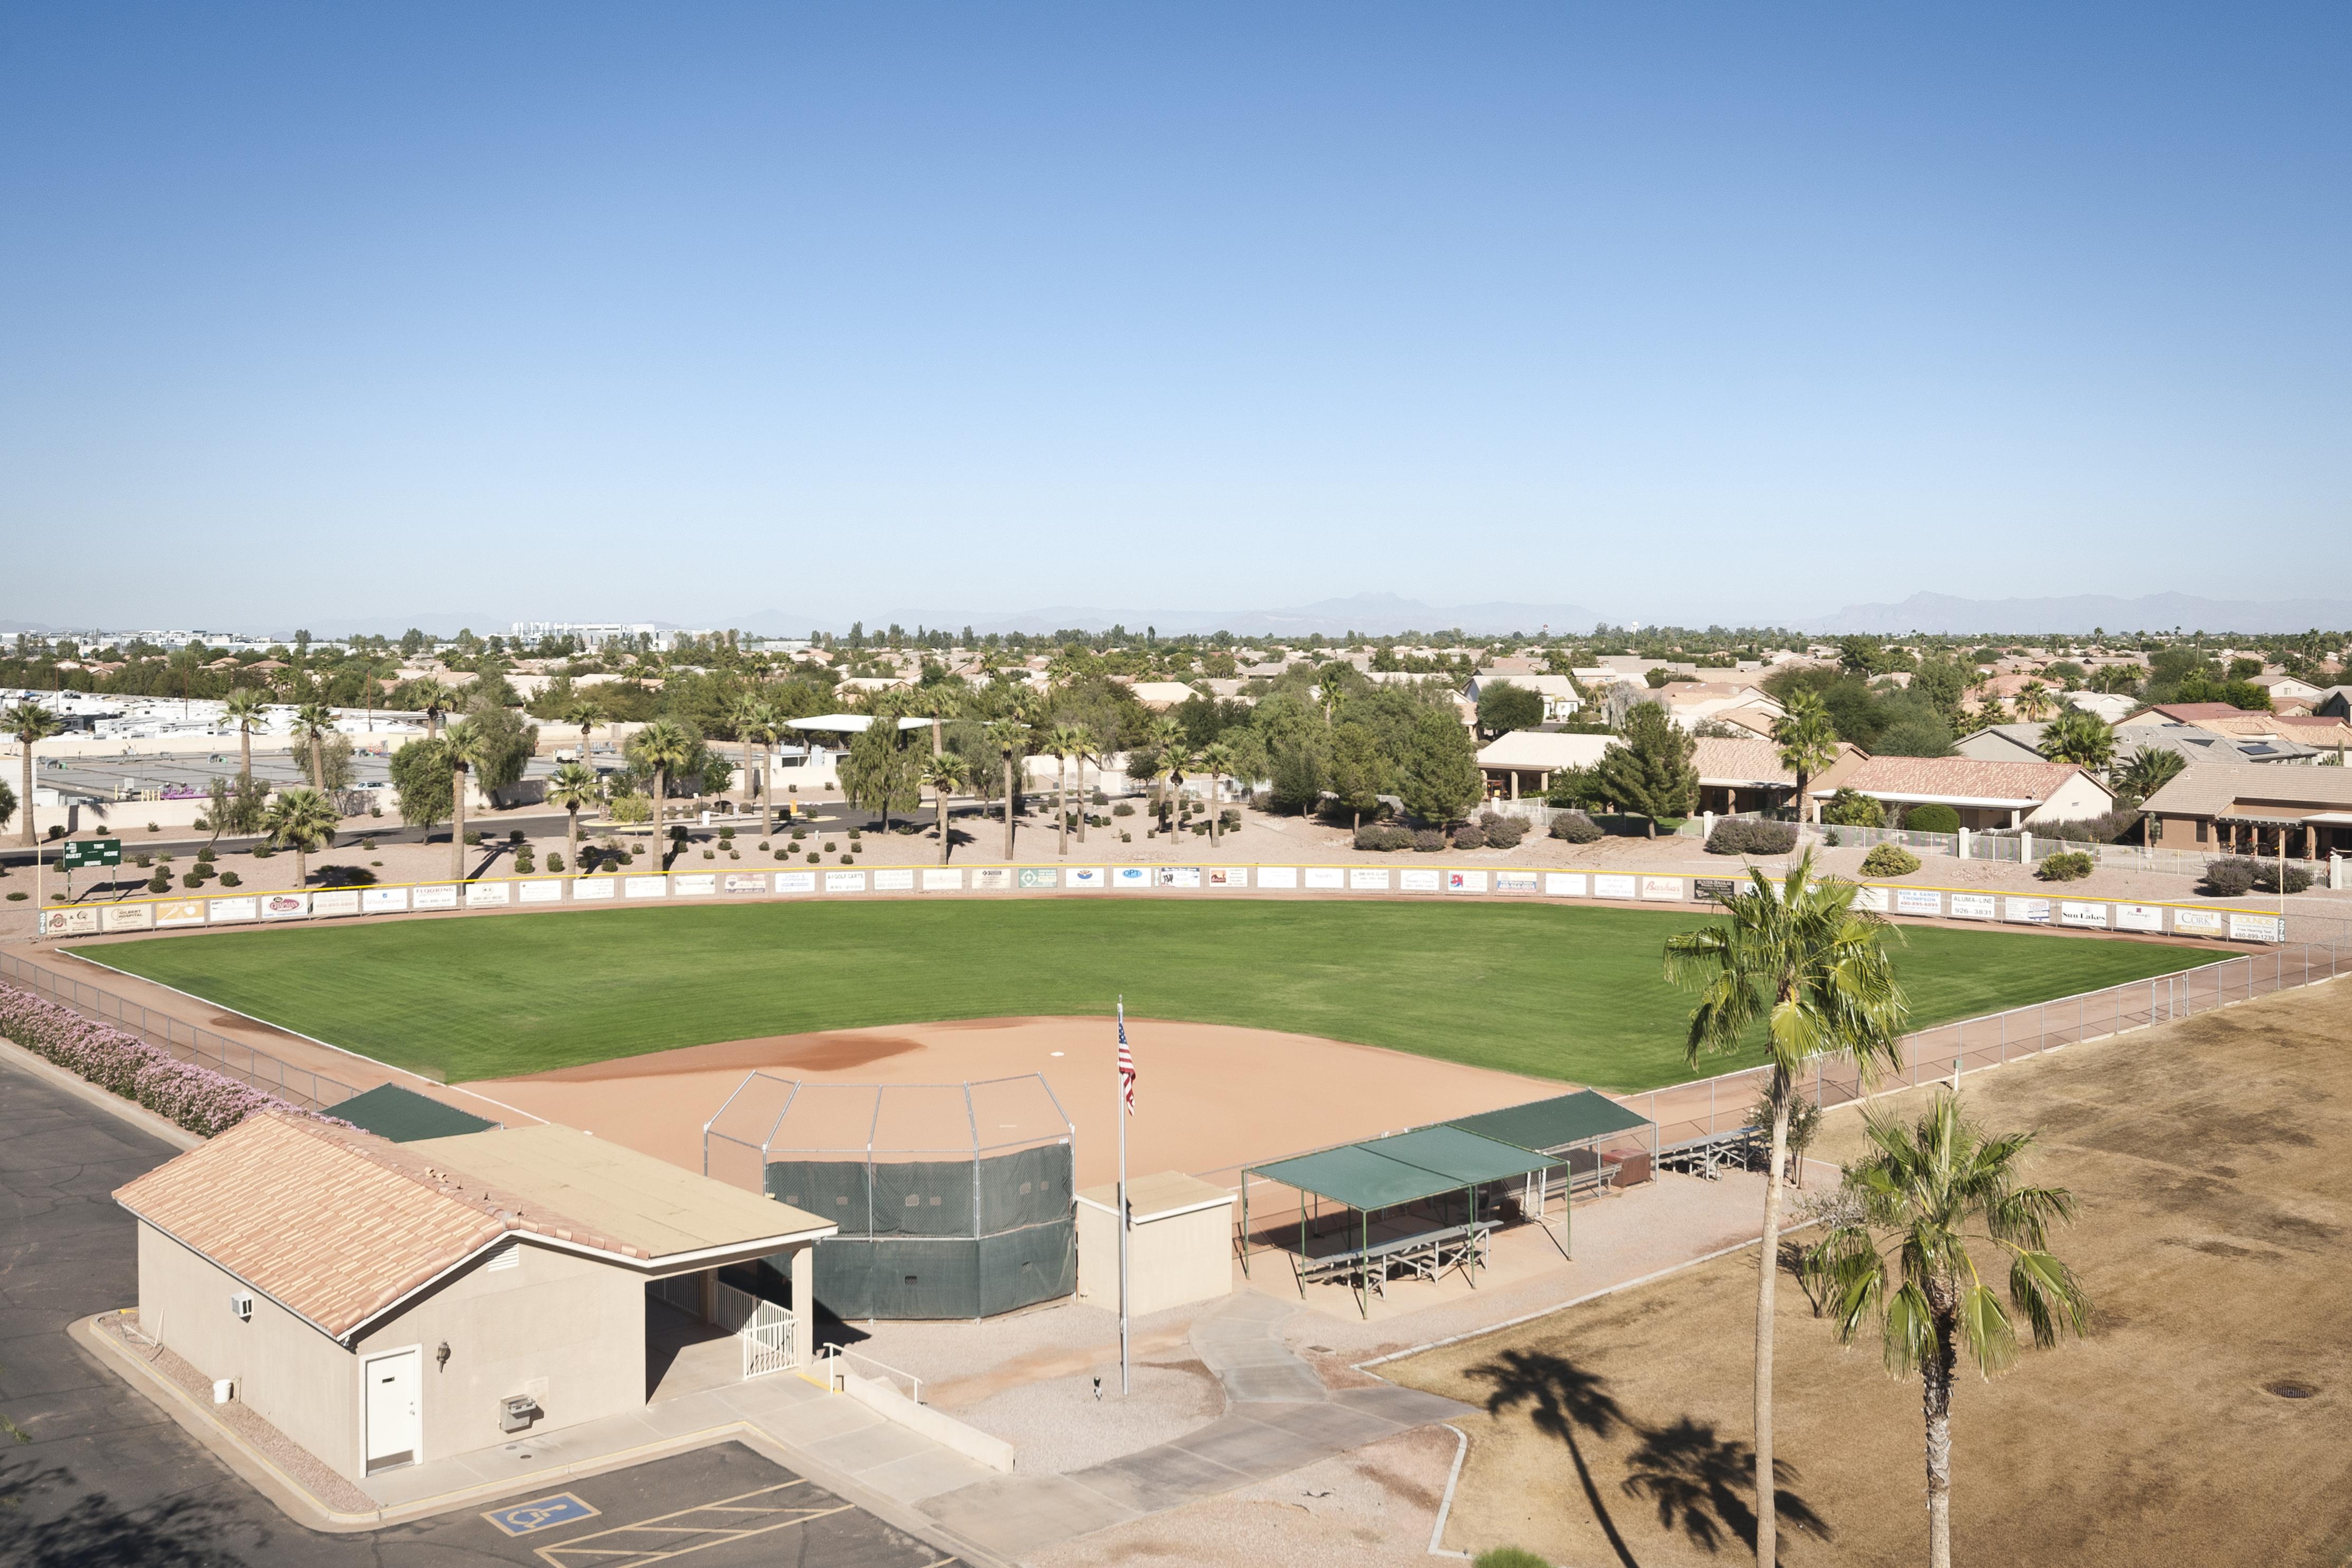 15 Community Softball Field